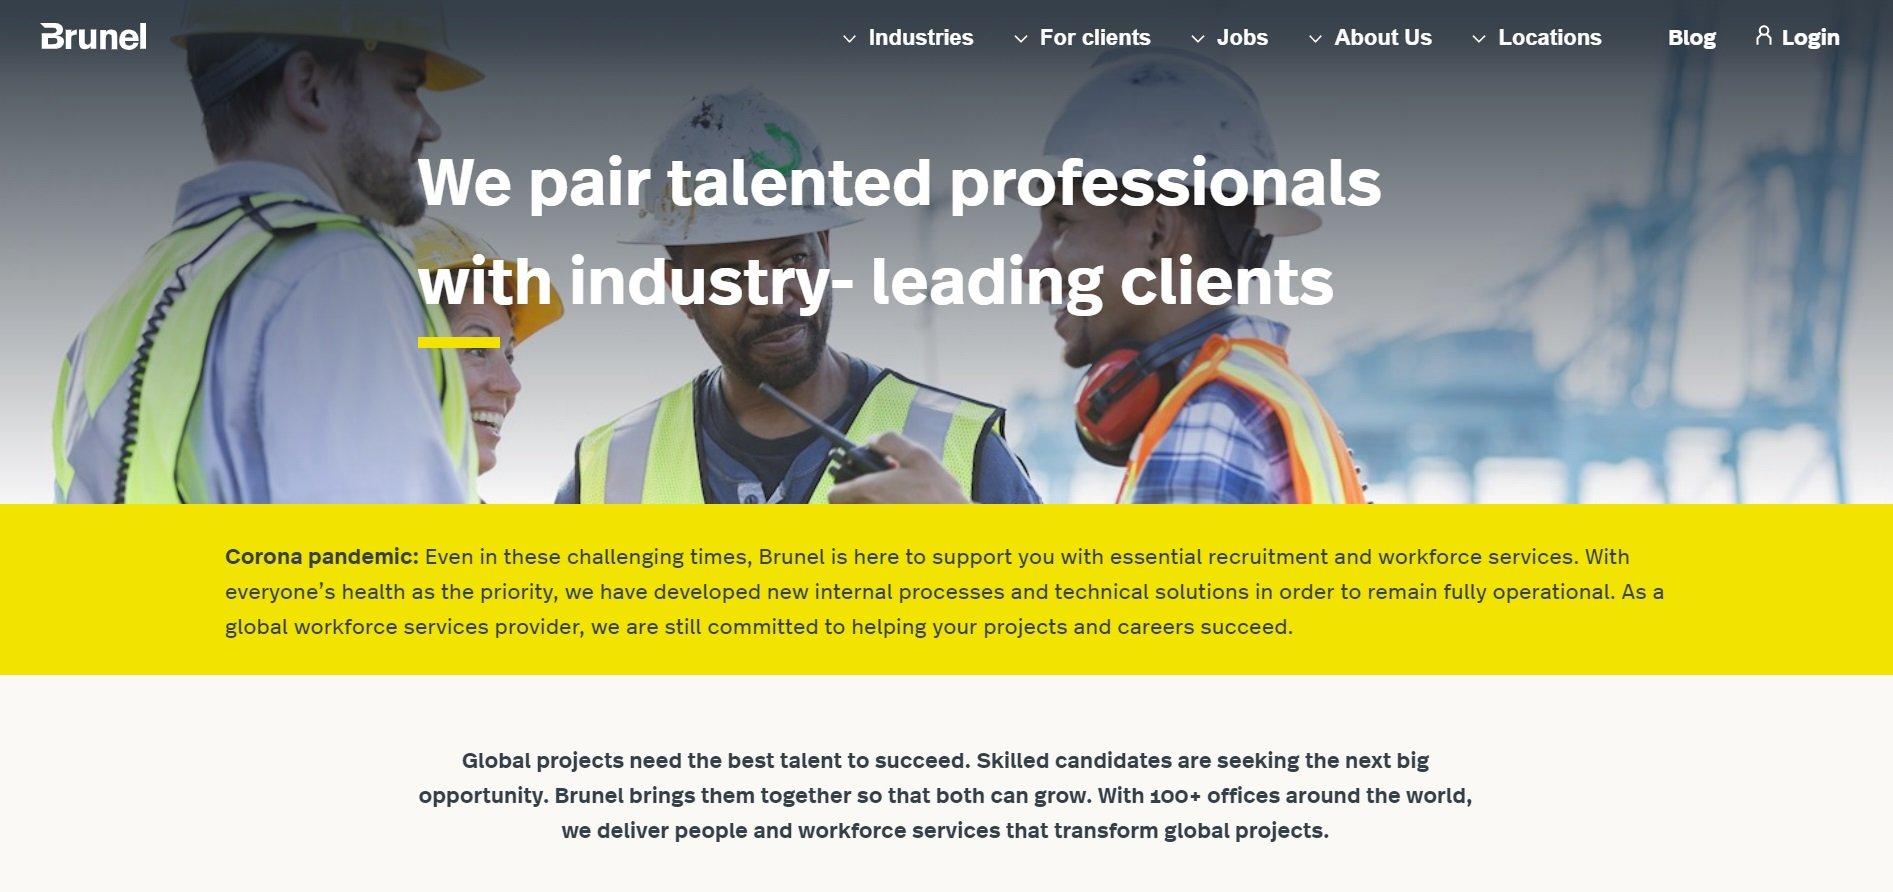 Screenshot of the Brunel website